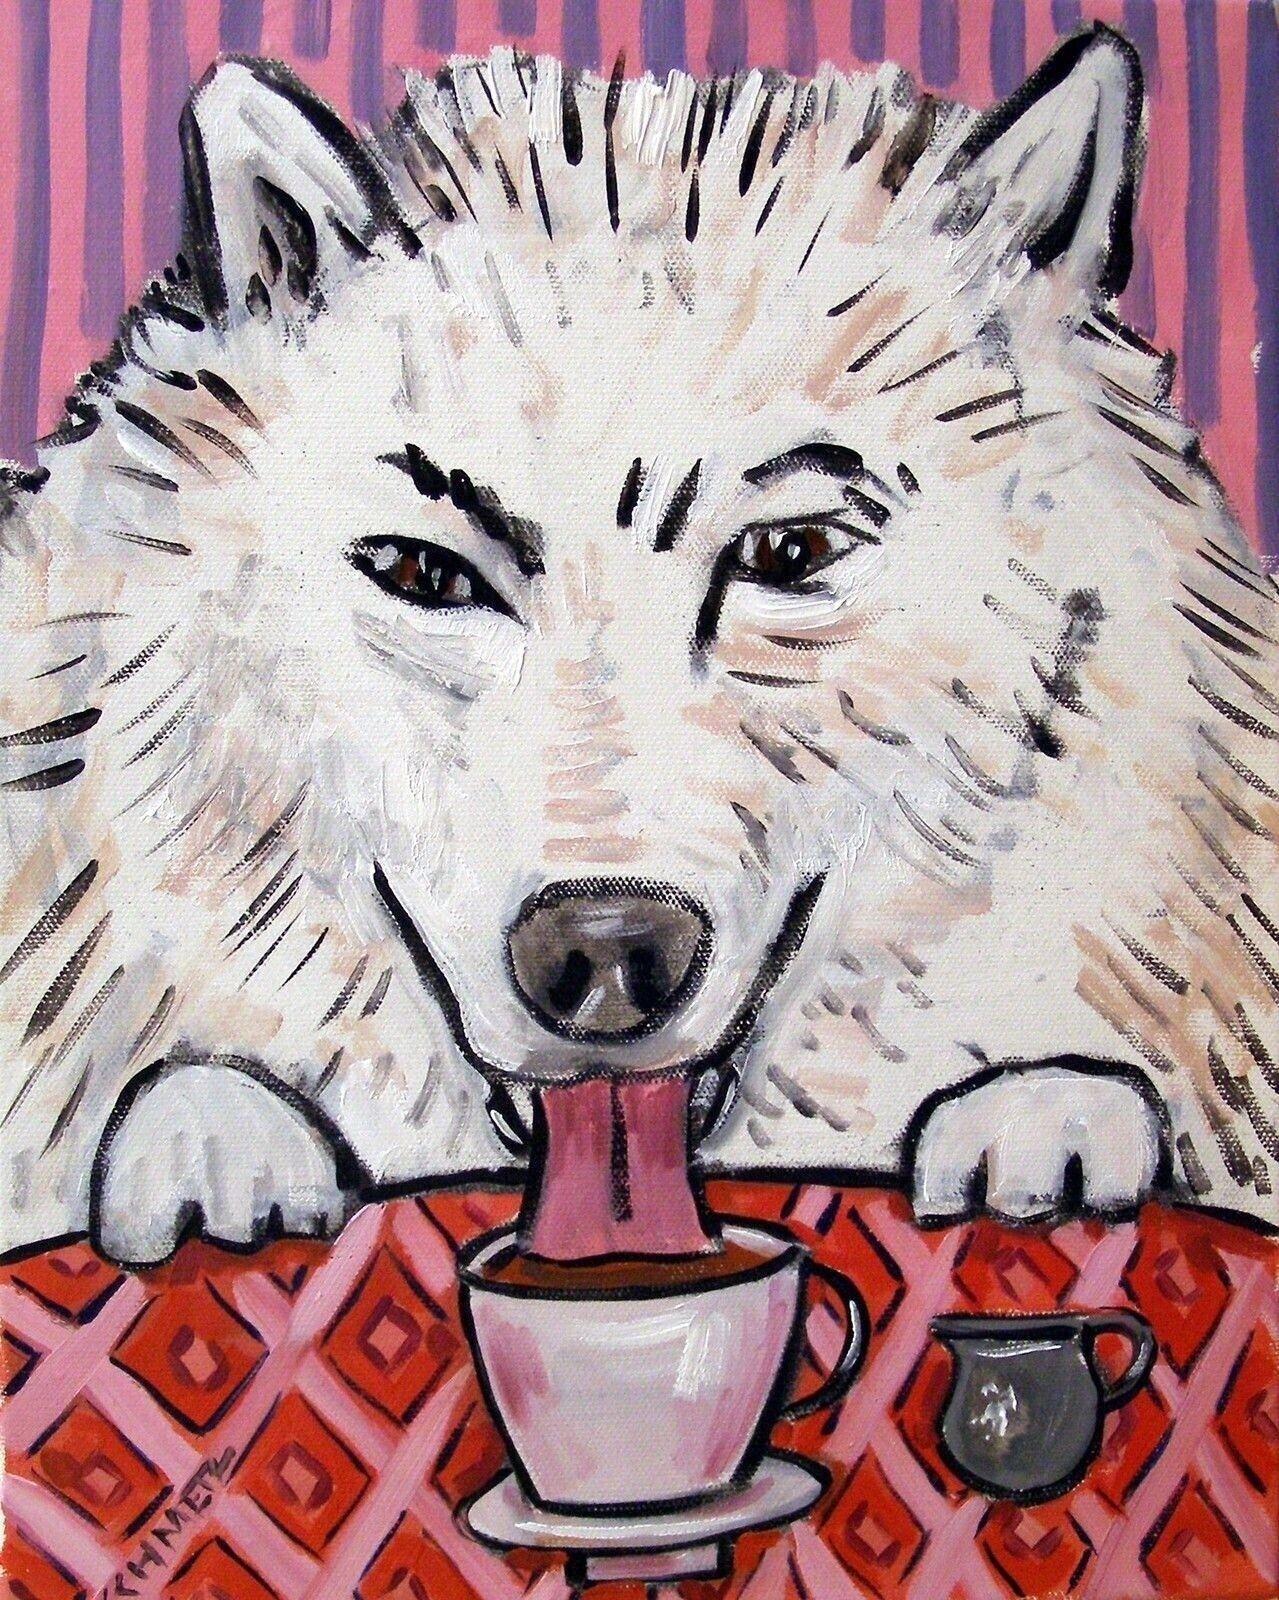 RUSSIAN SHEEPDOG coffee painting dog art  13x19  GLOSSY PRINT